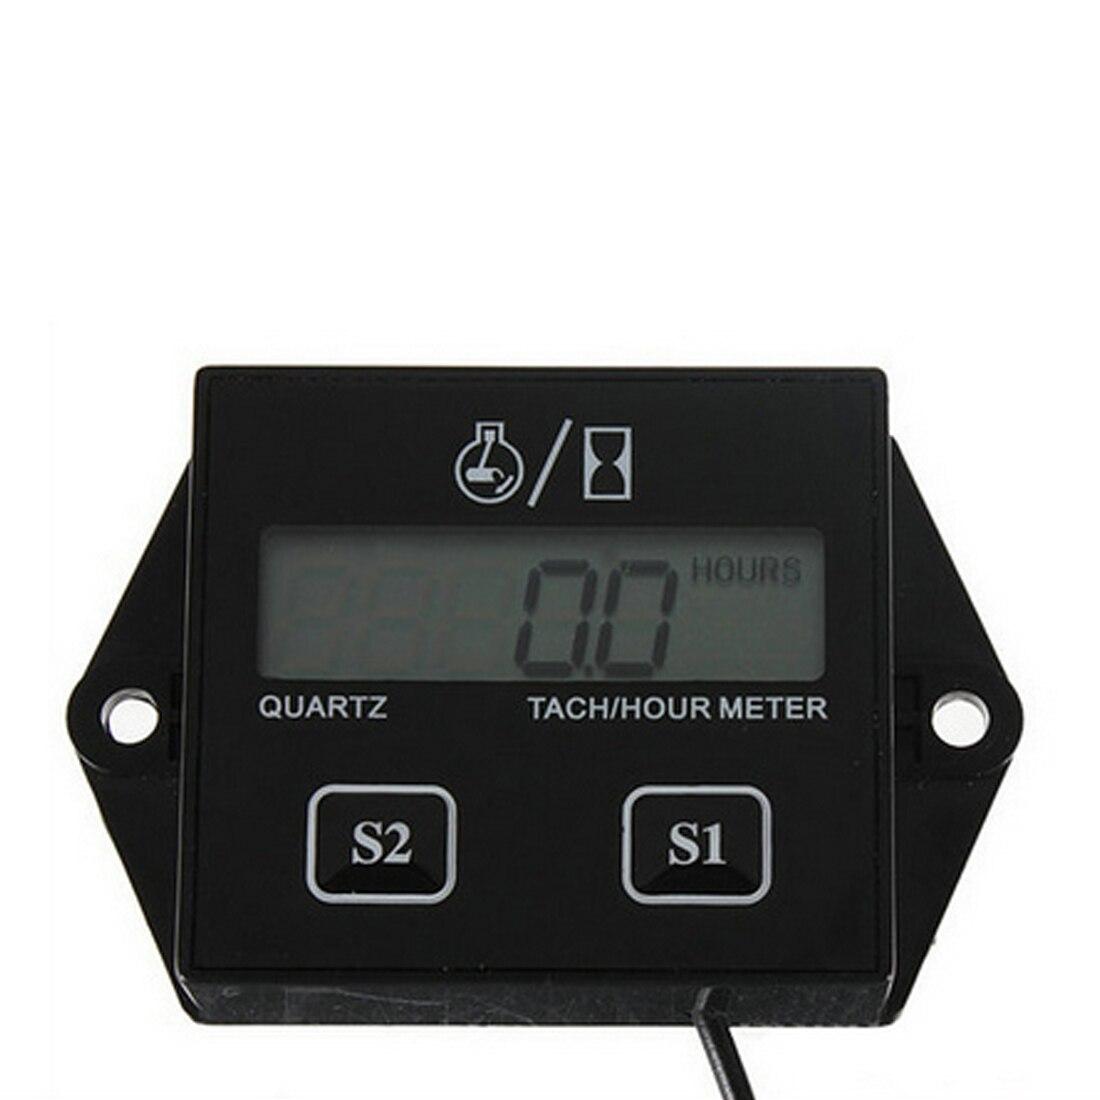 Новое поступление ЖК-дисплей Тахометр RPM Тахометр, датчик вращения Цифровой тахометр двигателя счетчик часов для автомобиля лодки мотоцикл...